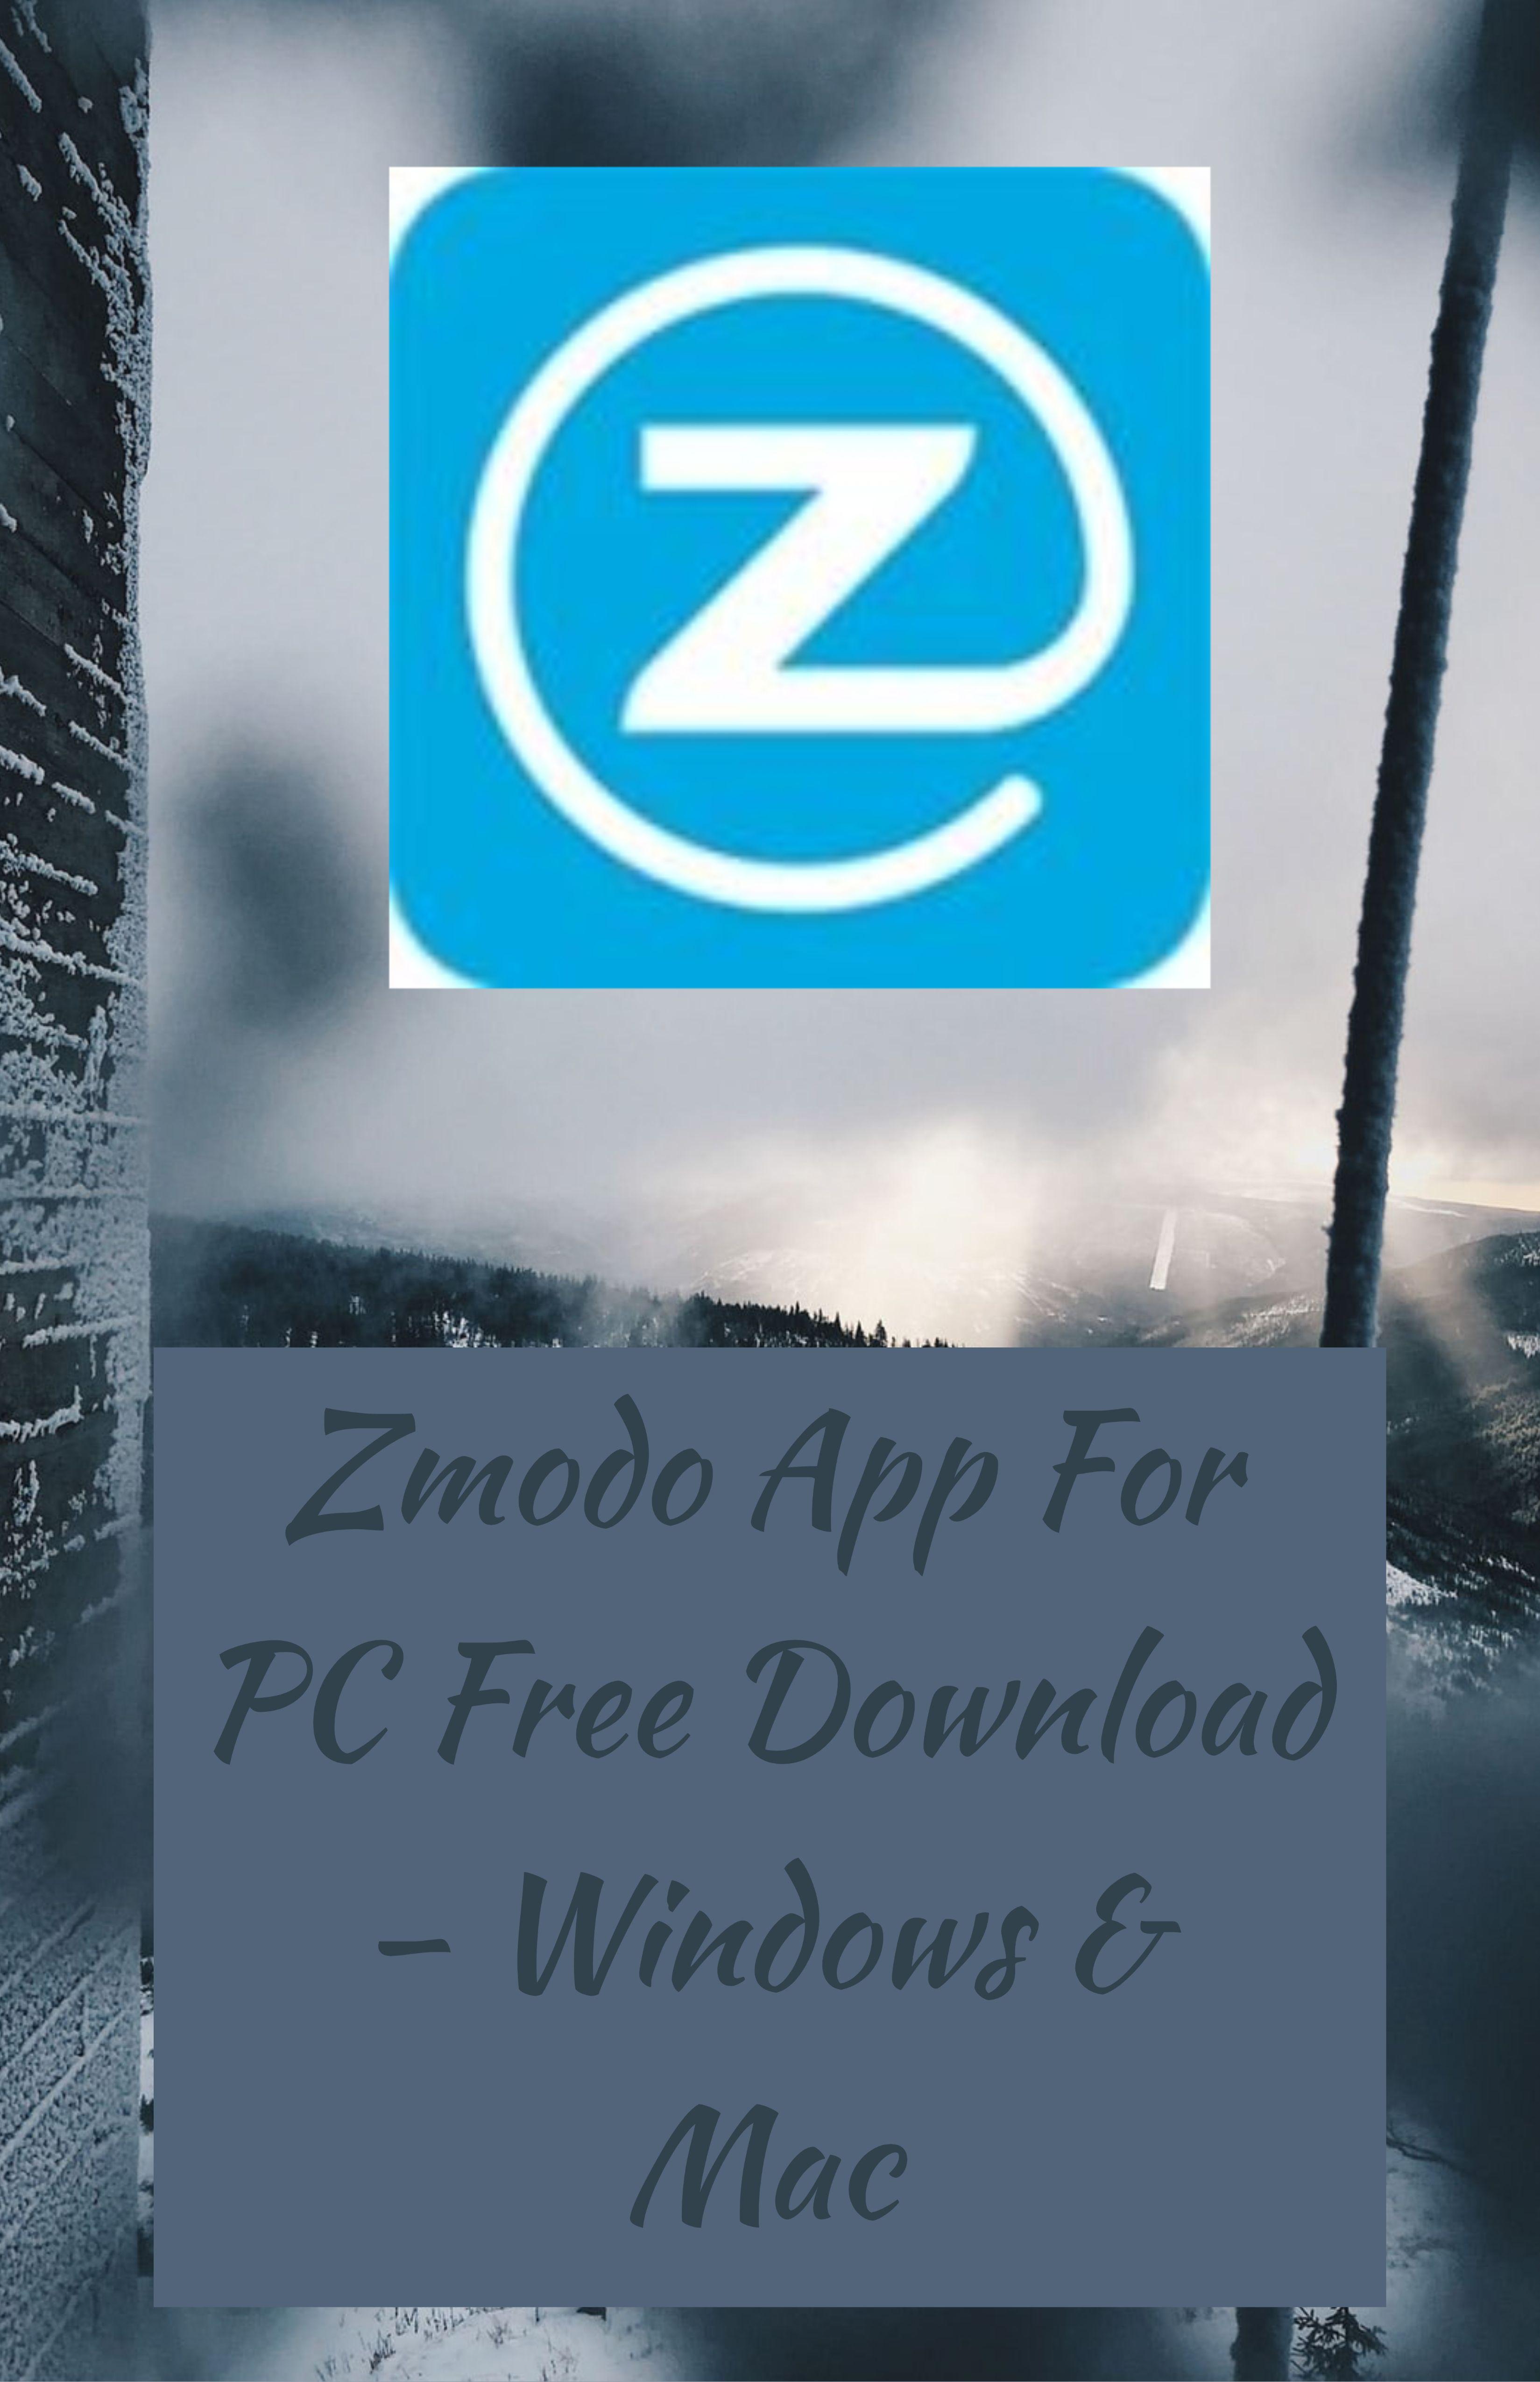 Download zmodo for pc windowsmac in 2020 app slow